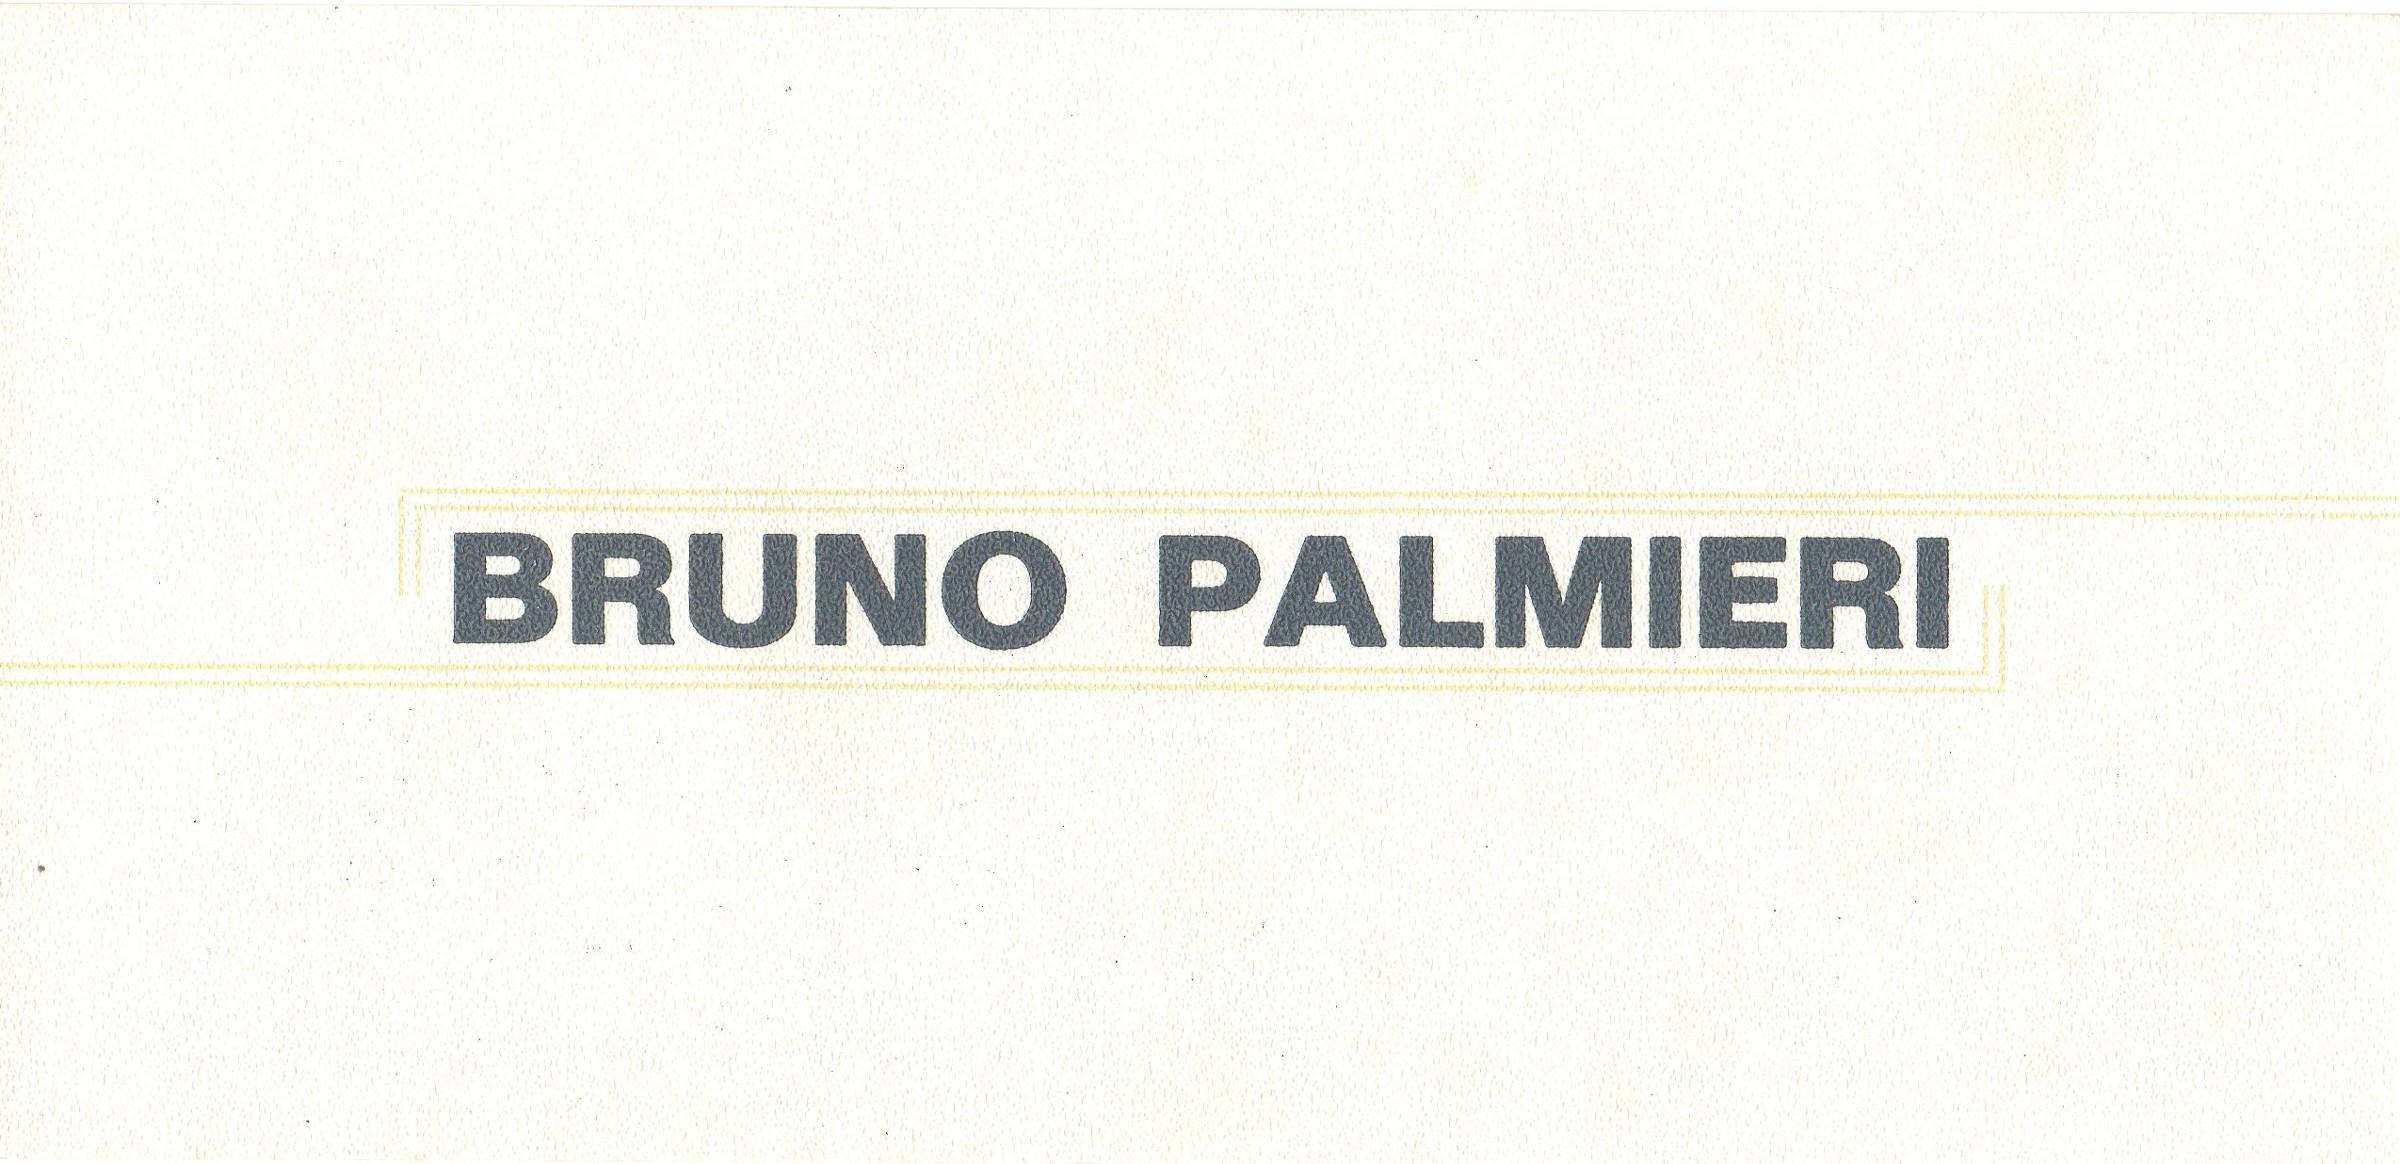 bruno palmieri